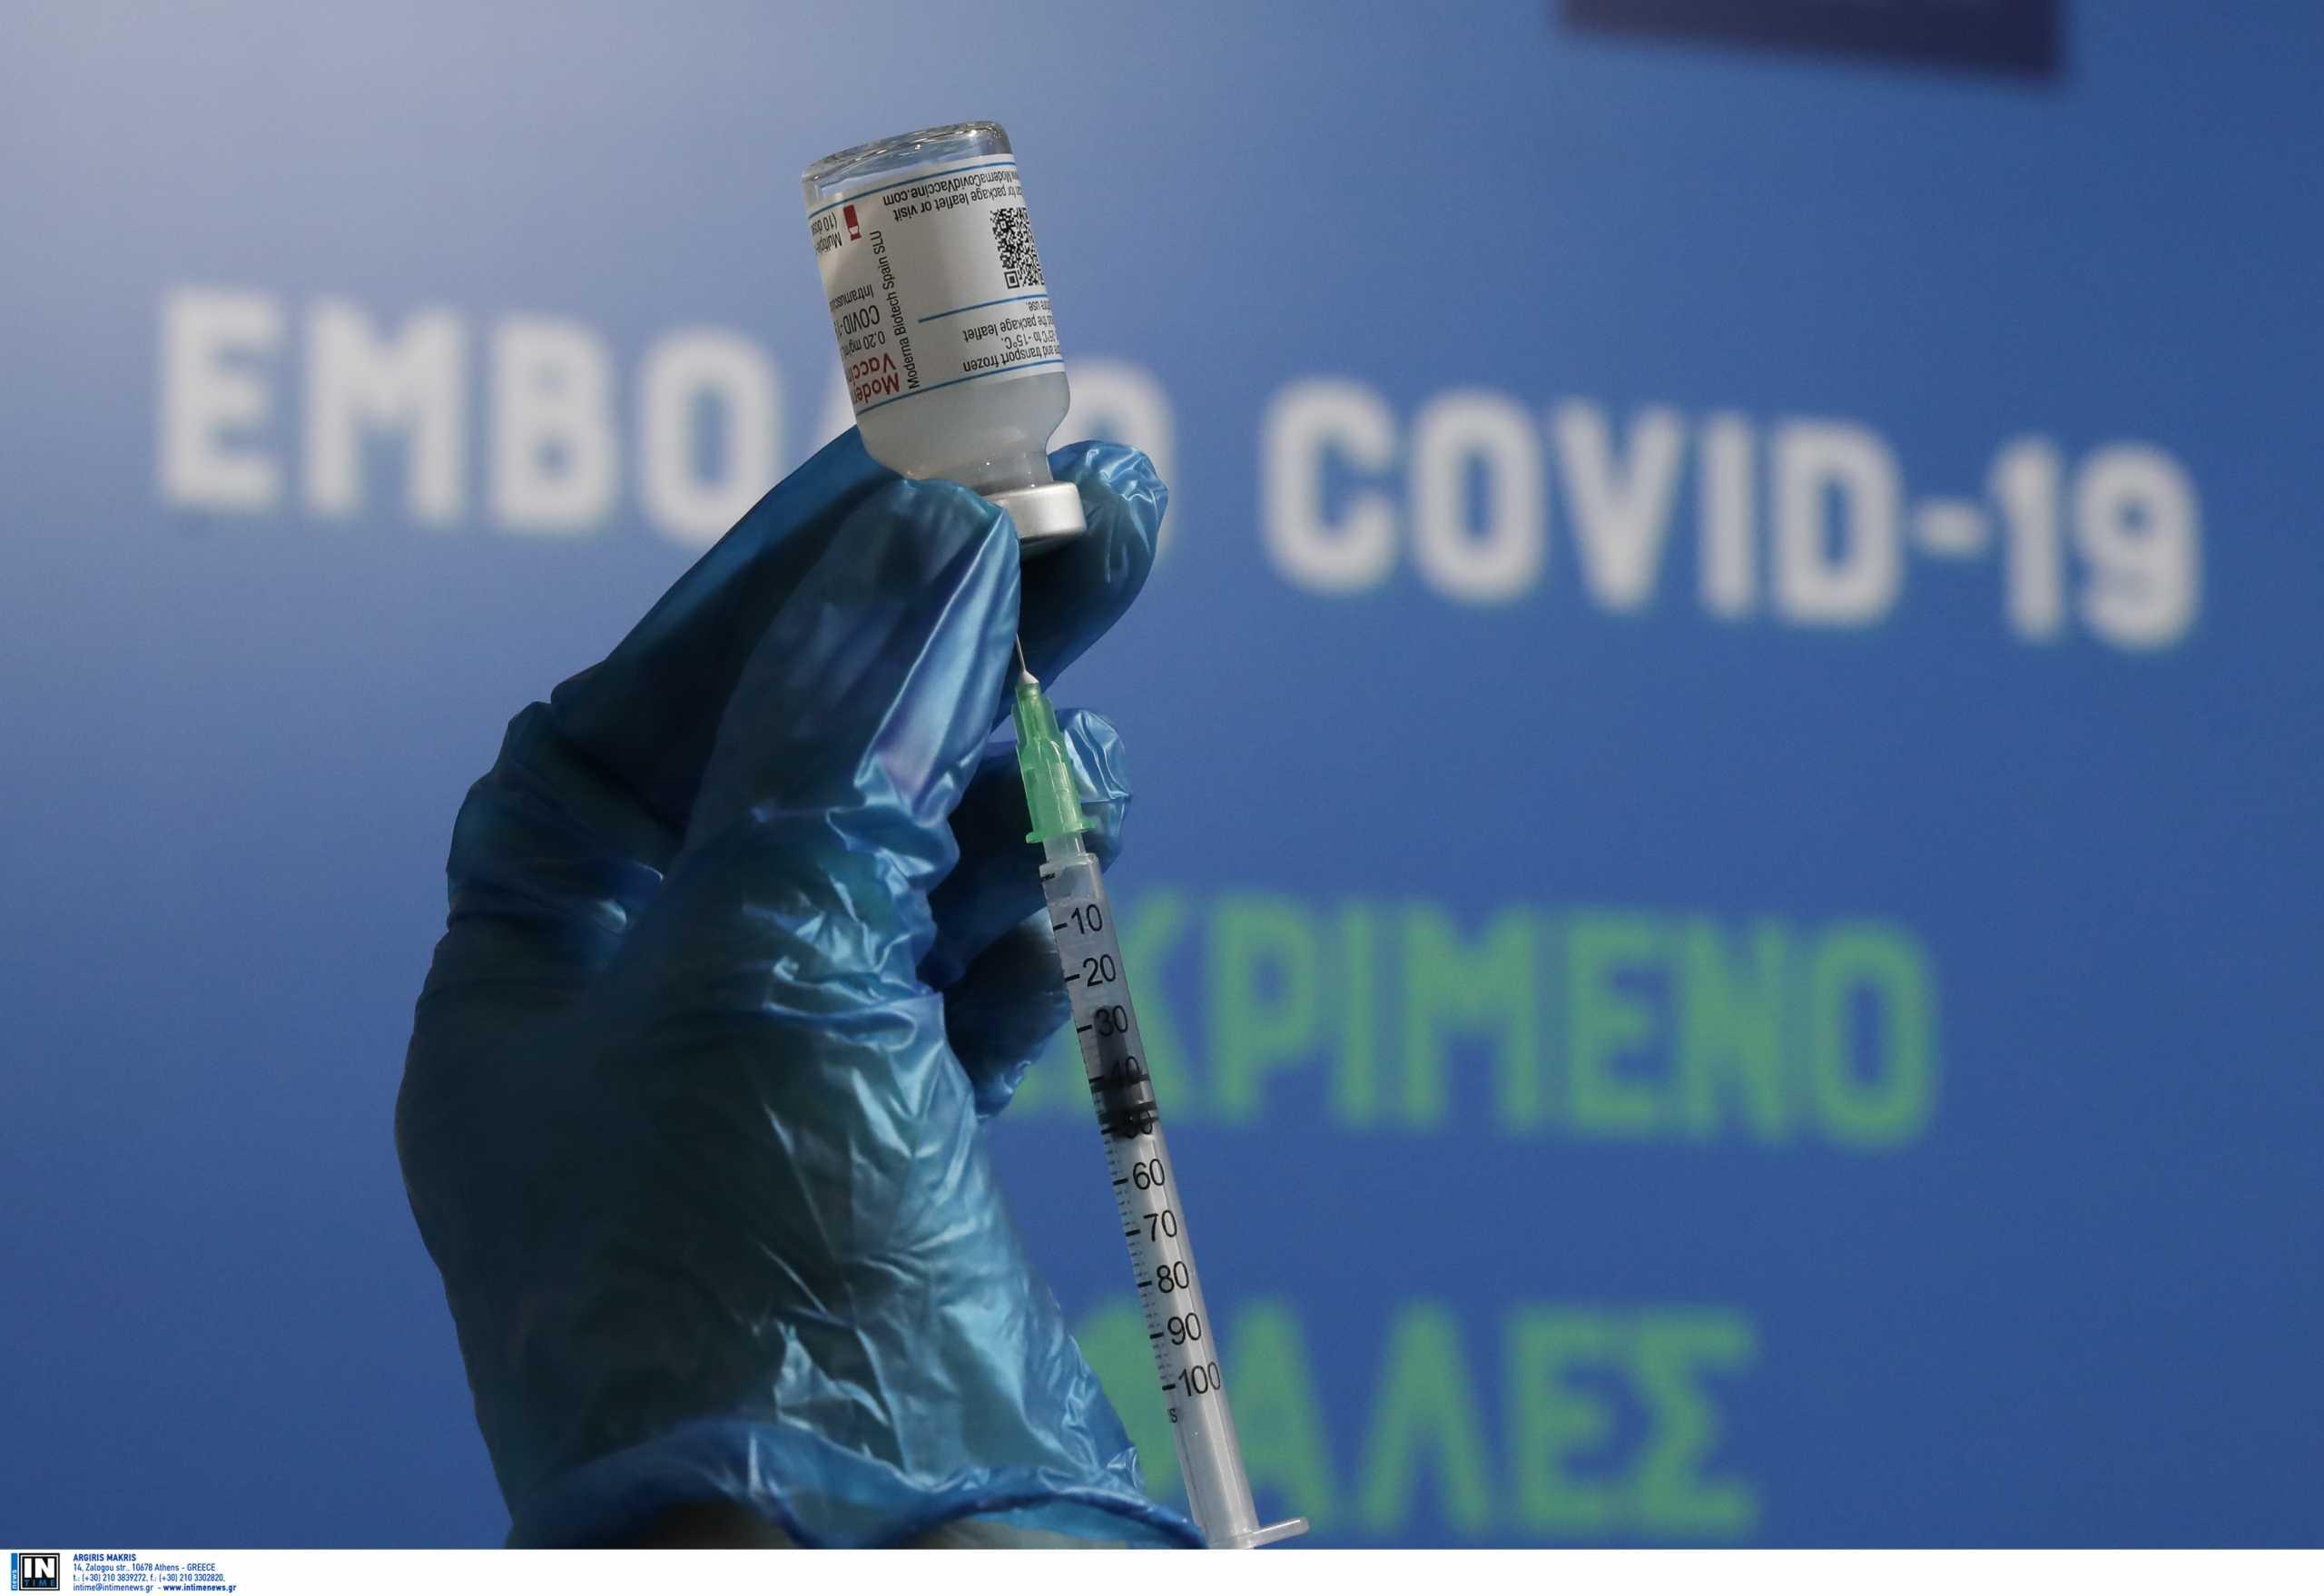 ECDC για εμβόλιο κορονοϊού: Ποιοι θα πρέπει να κάνουν τρίτη δόση